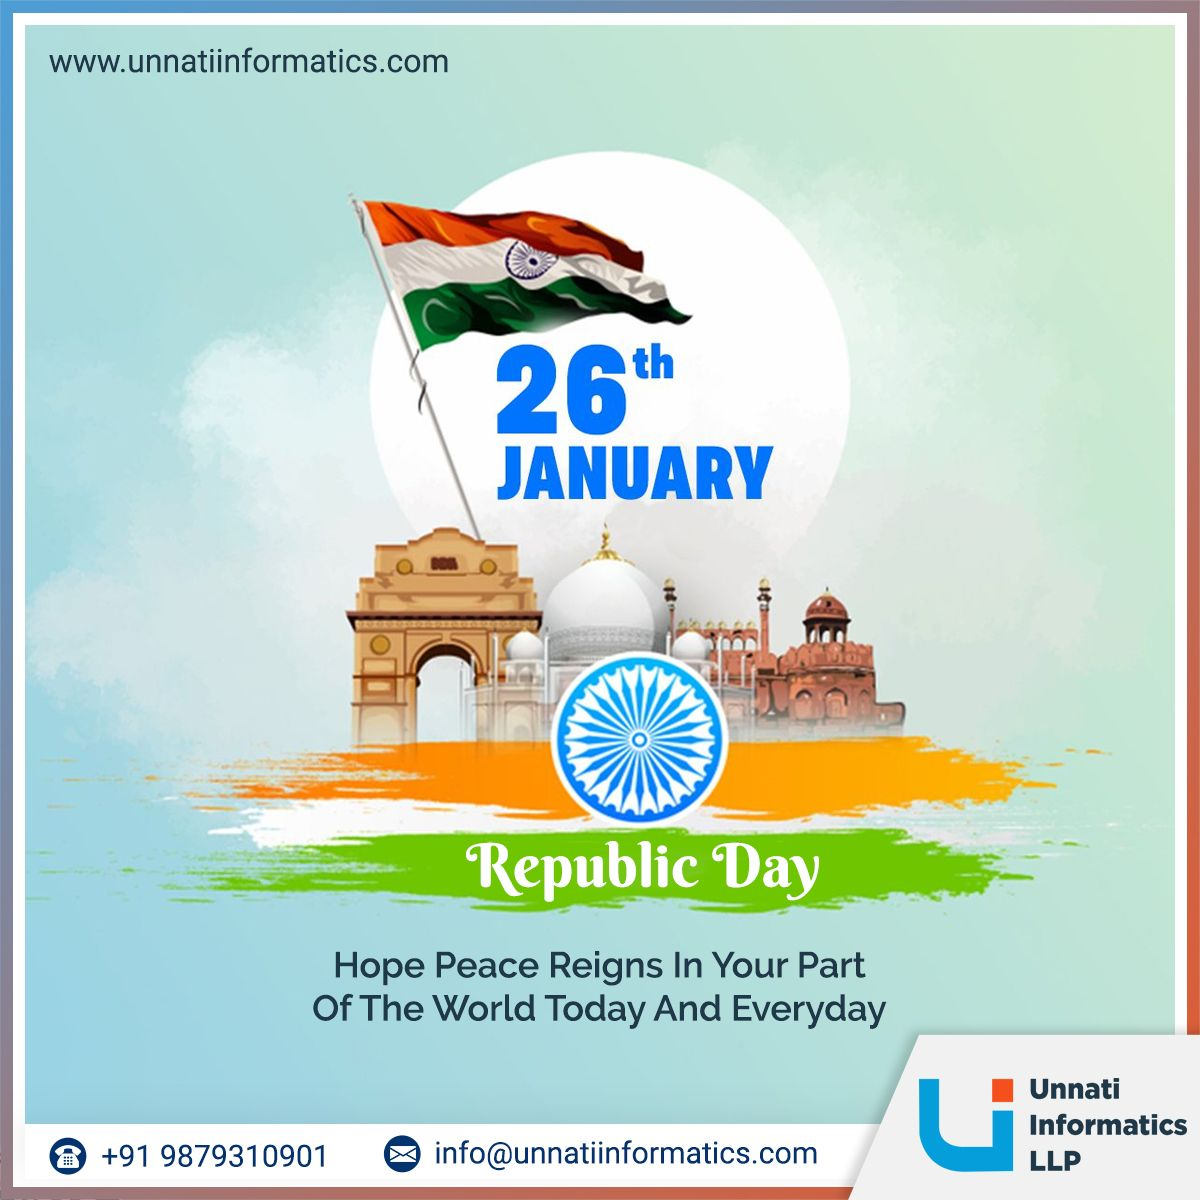 Happy Republic Day 2021 In 2021 Republic Day Republic Day India Day Happy republic day 2021 images india